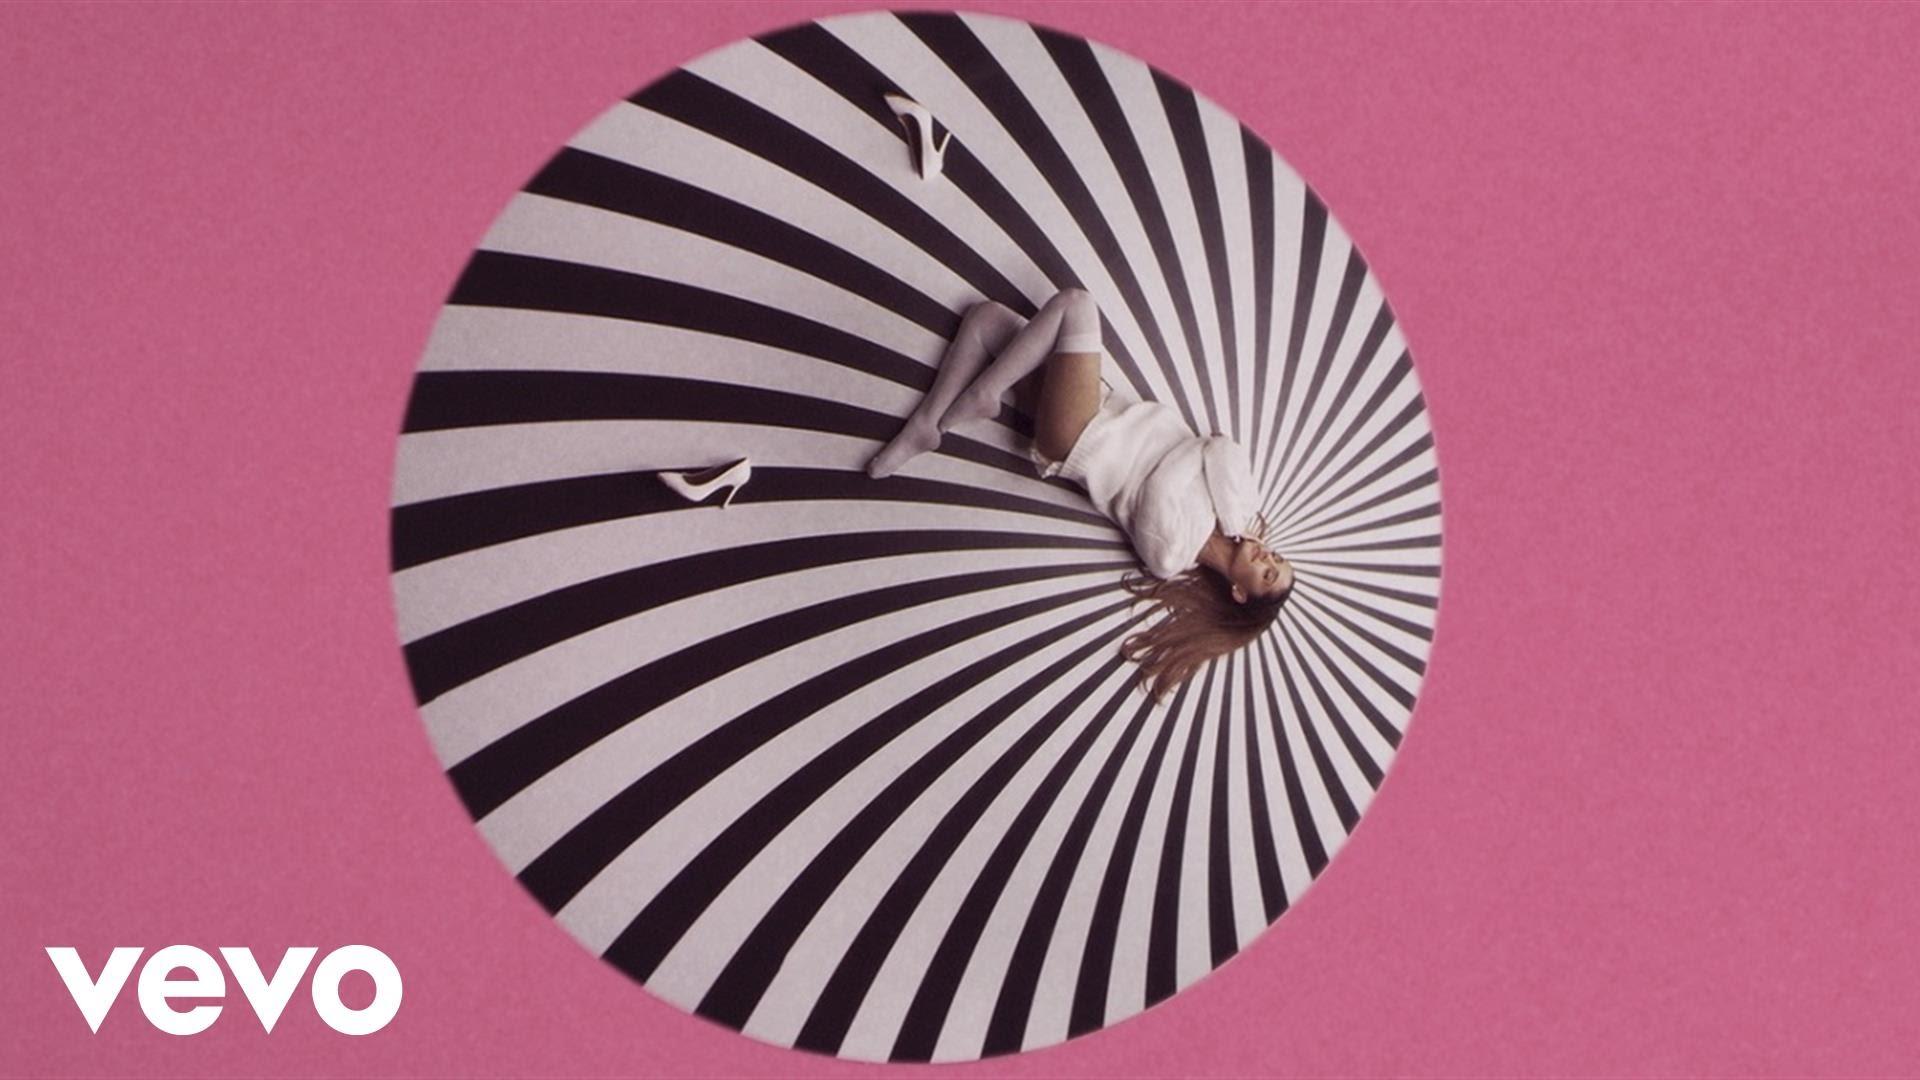 Ariana Grande — Problem ft. Iggy Azalea